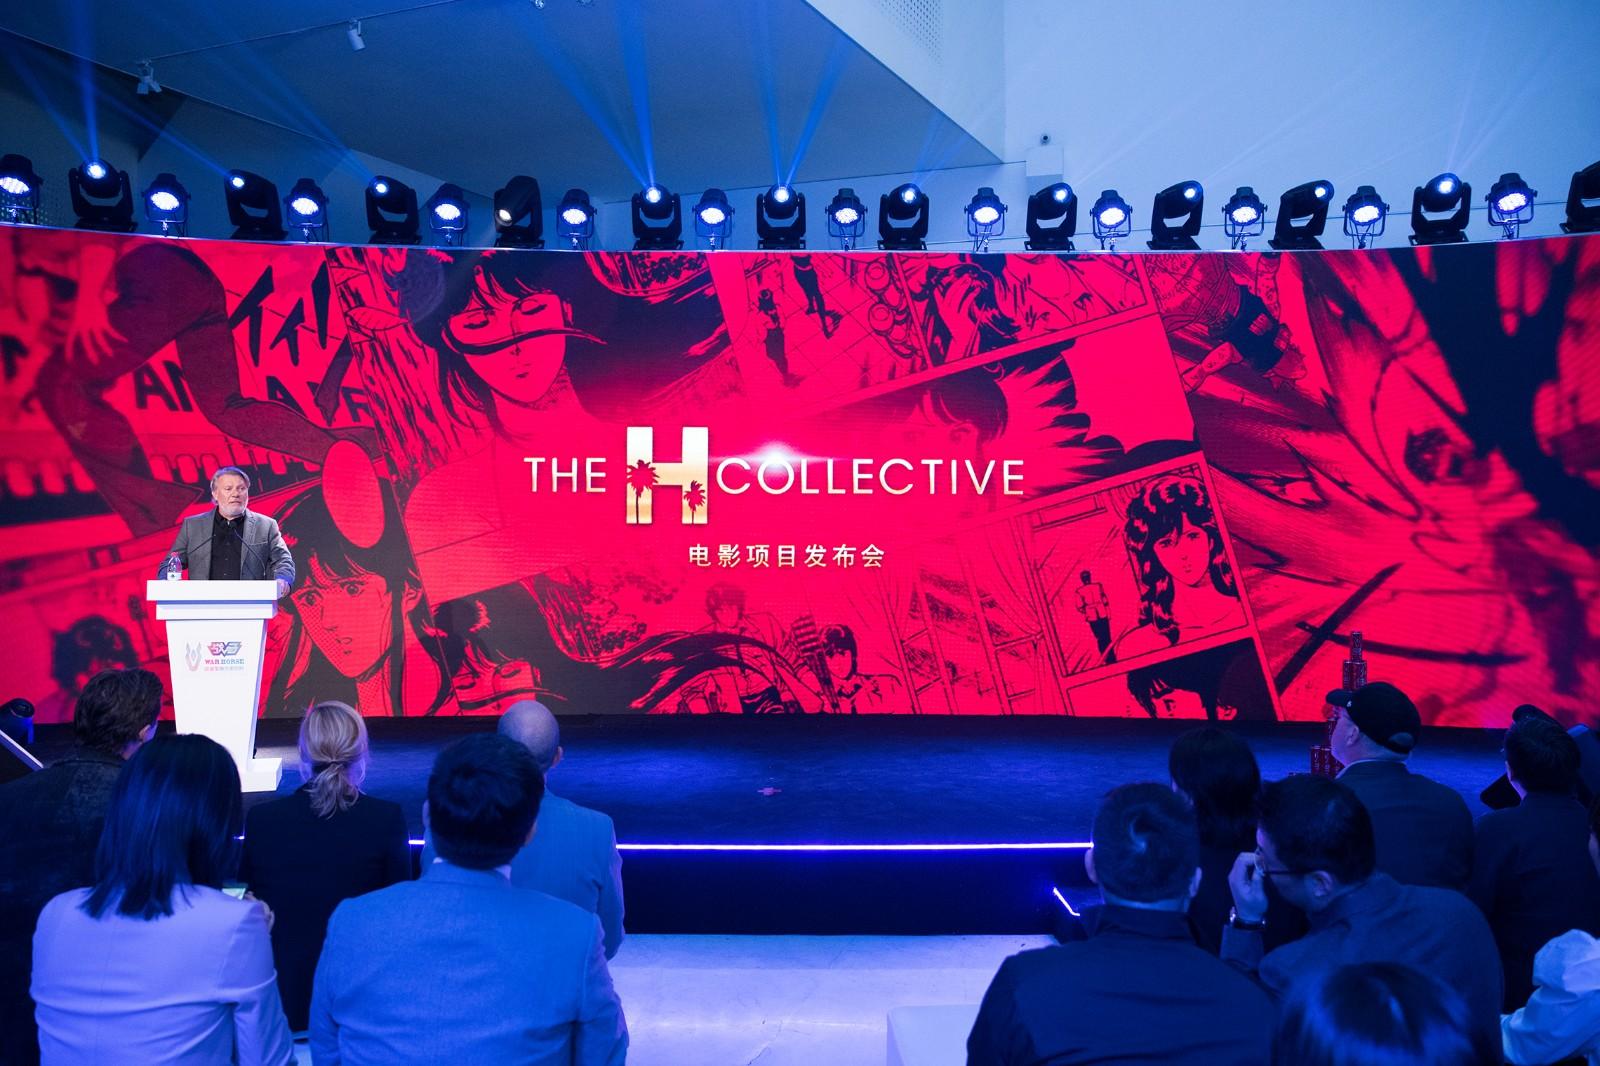 The H Collective携手范·迪塞尔购得《极限特工》系列电影版权